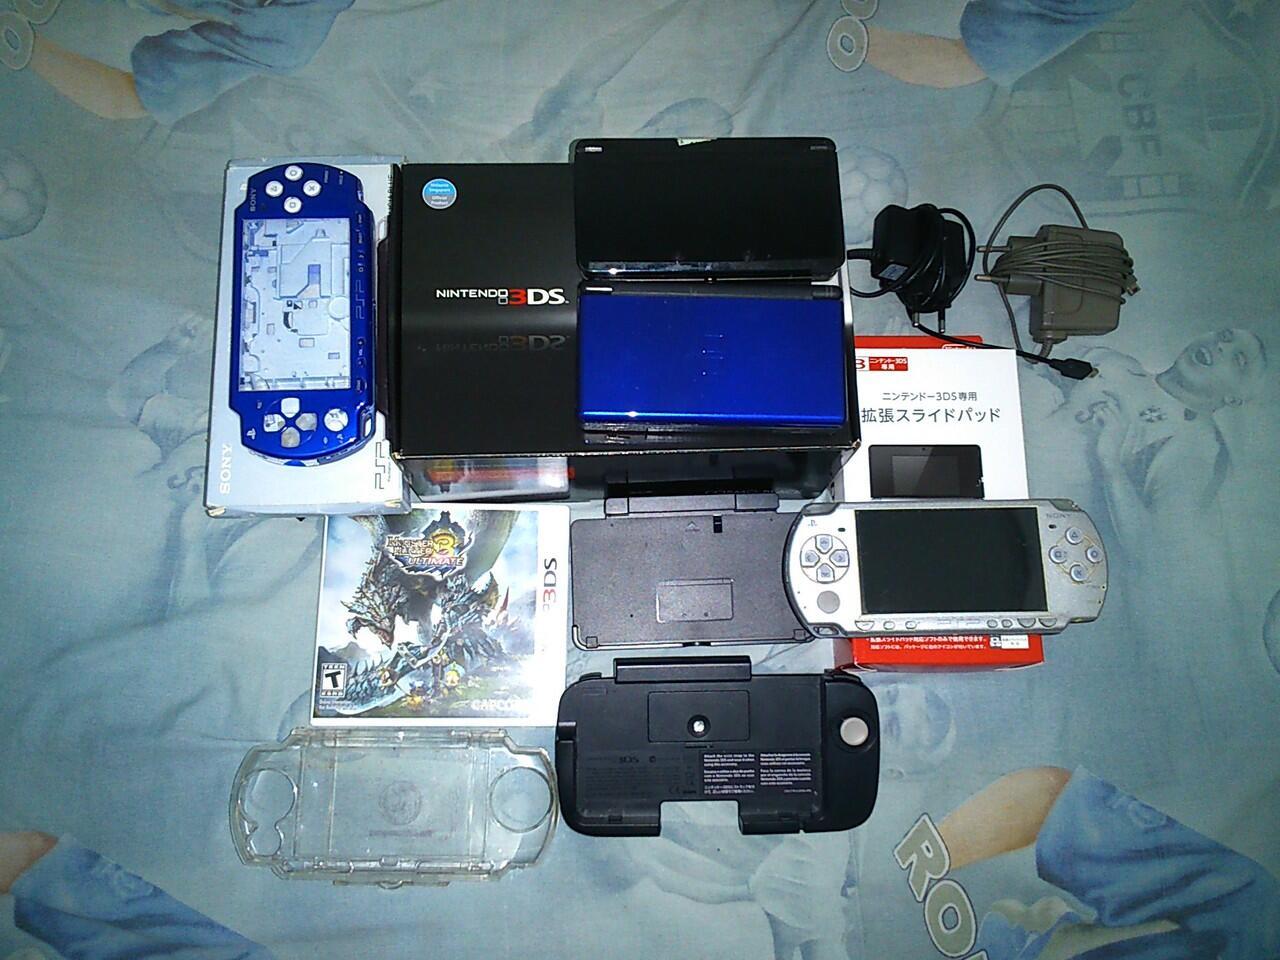 1 Paket : Nintendo 3ds + Nintendo Ds + Psp 2000